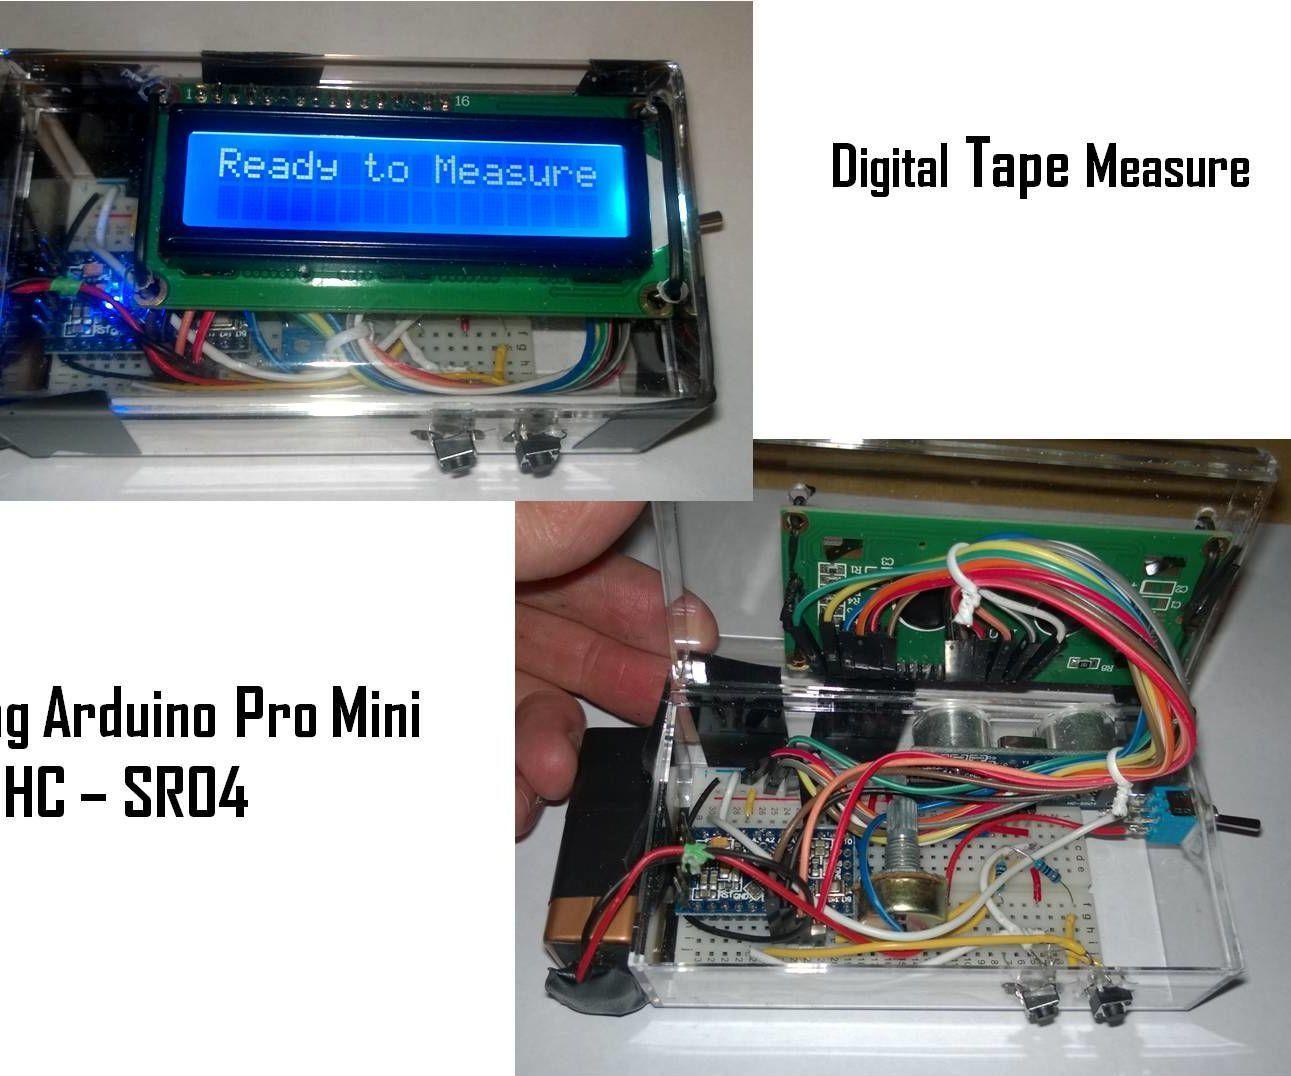 Digital Ultrasonic Tape Measure Tape measure, Arduino